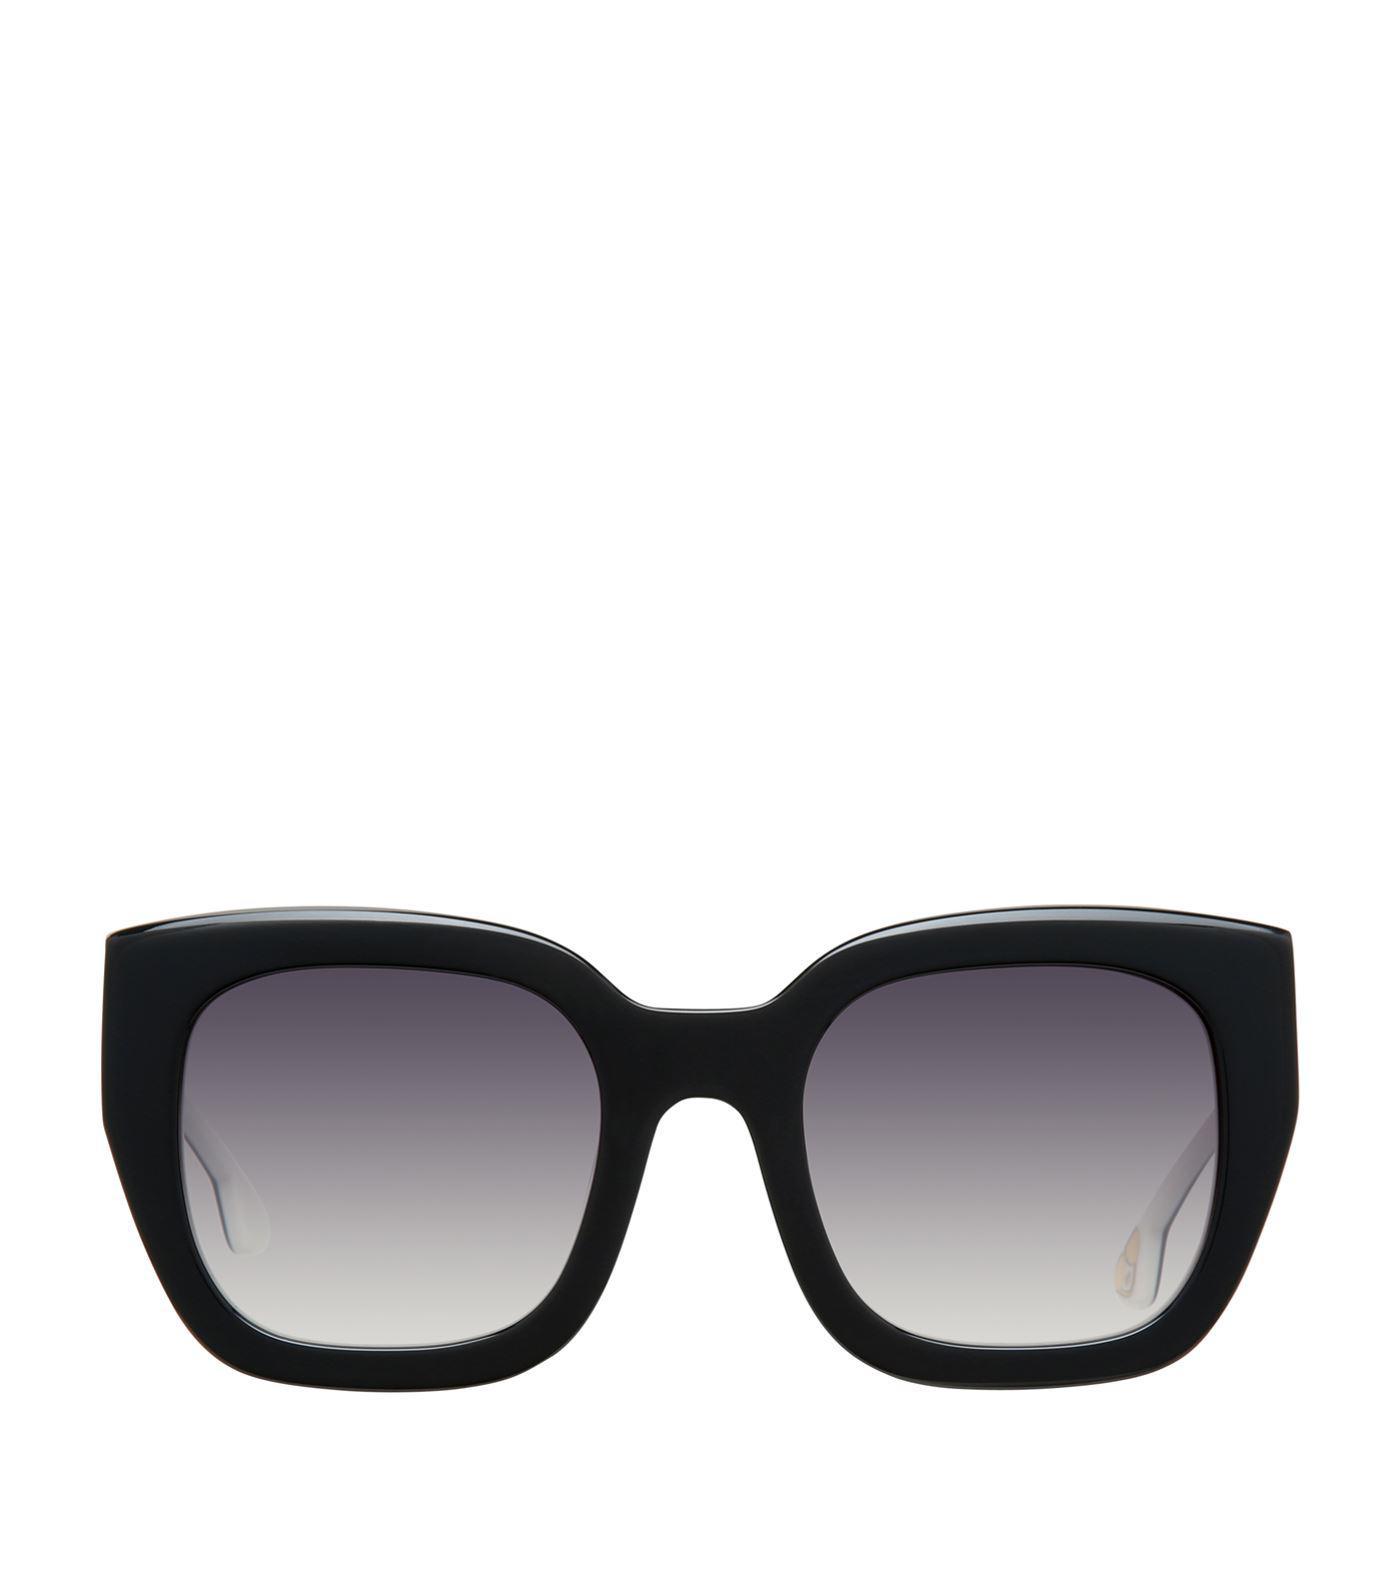 5f41a125f1 Lyst - Alice + Olivia Aberdeen Square Sunglasses in Black